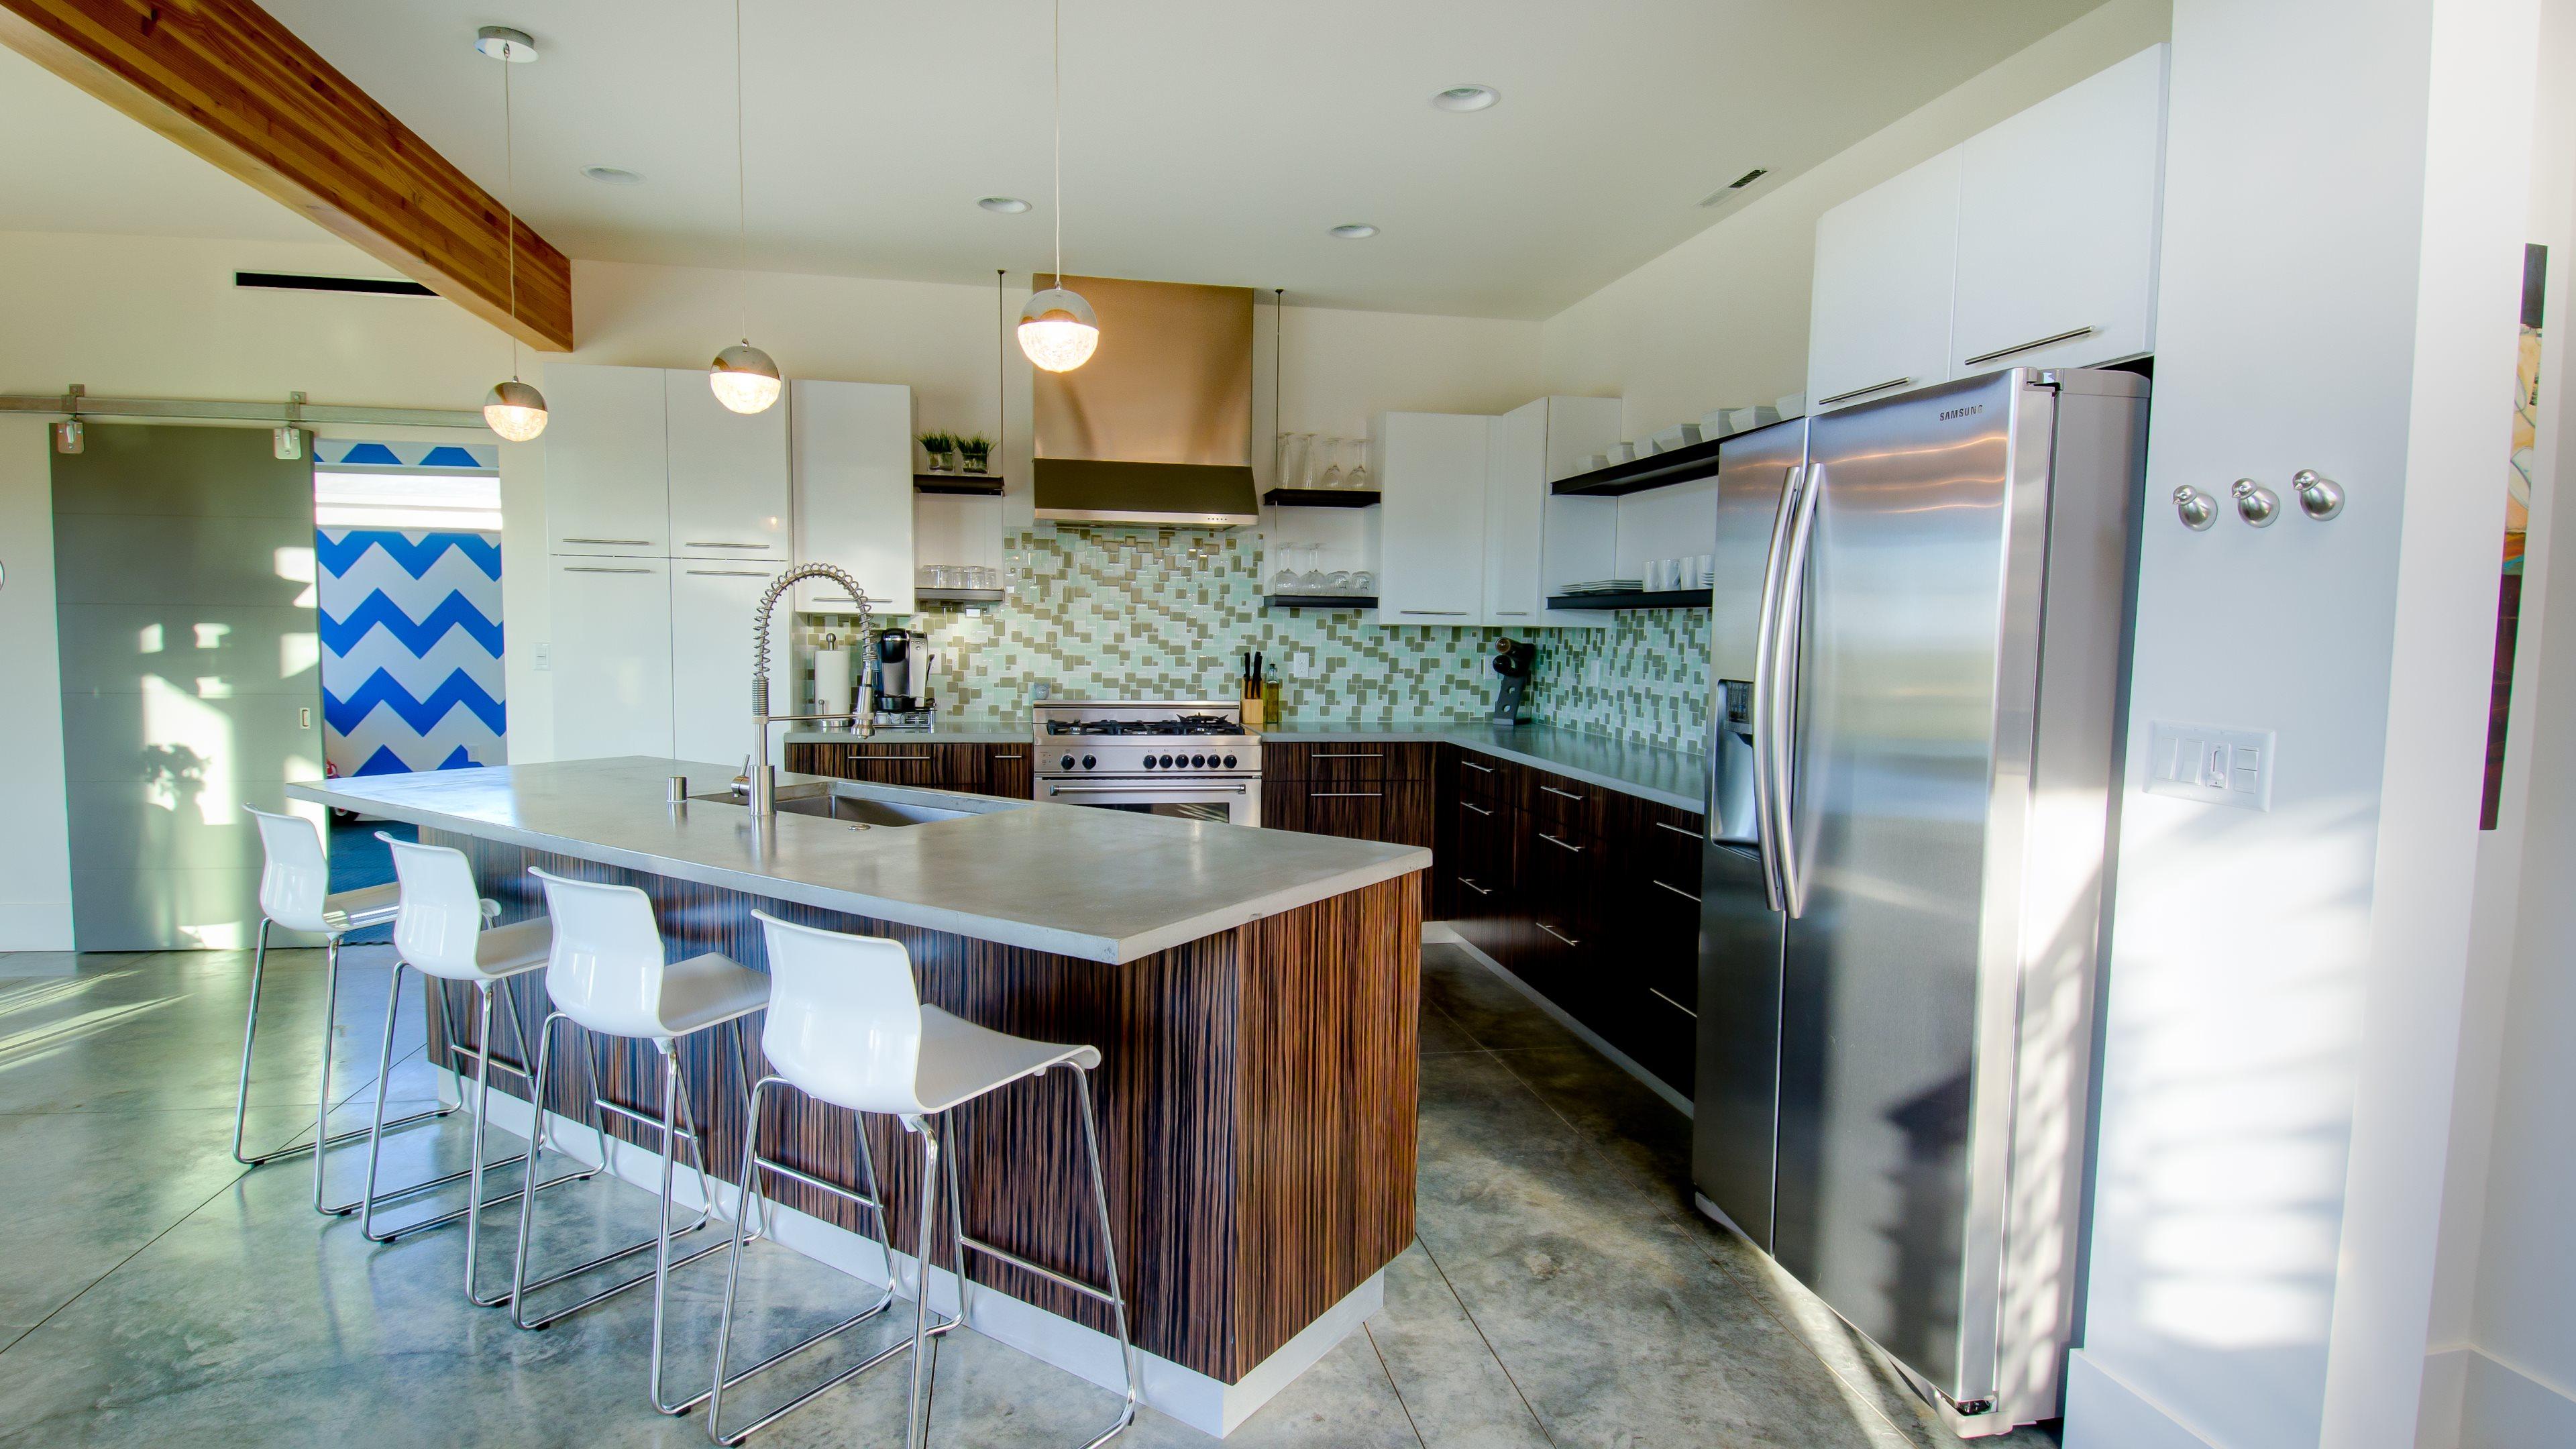 kitchen_ultra-HD-baggrunde